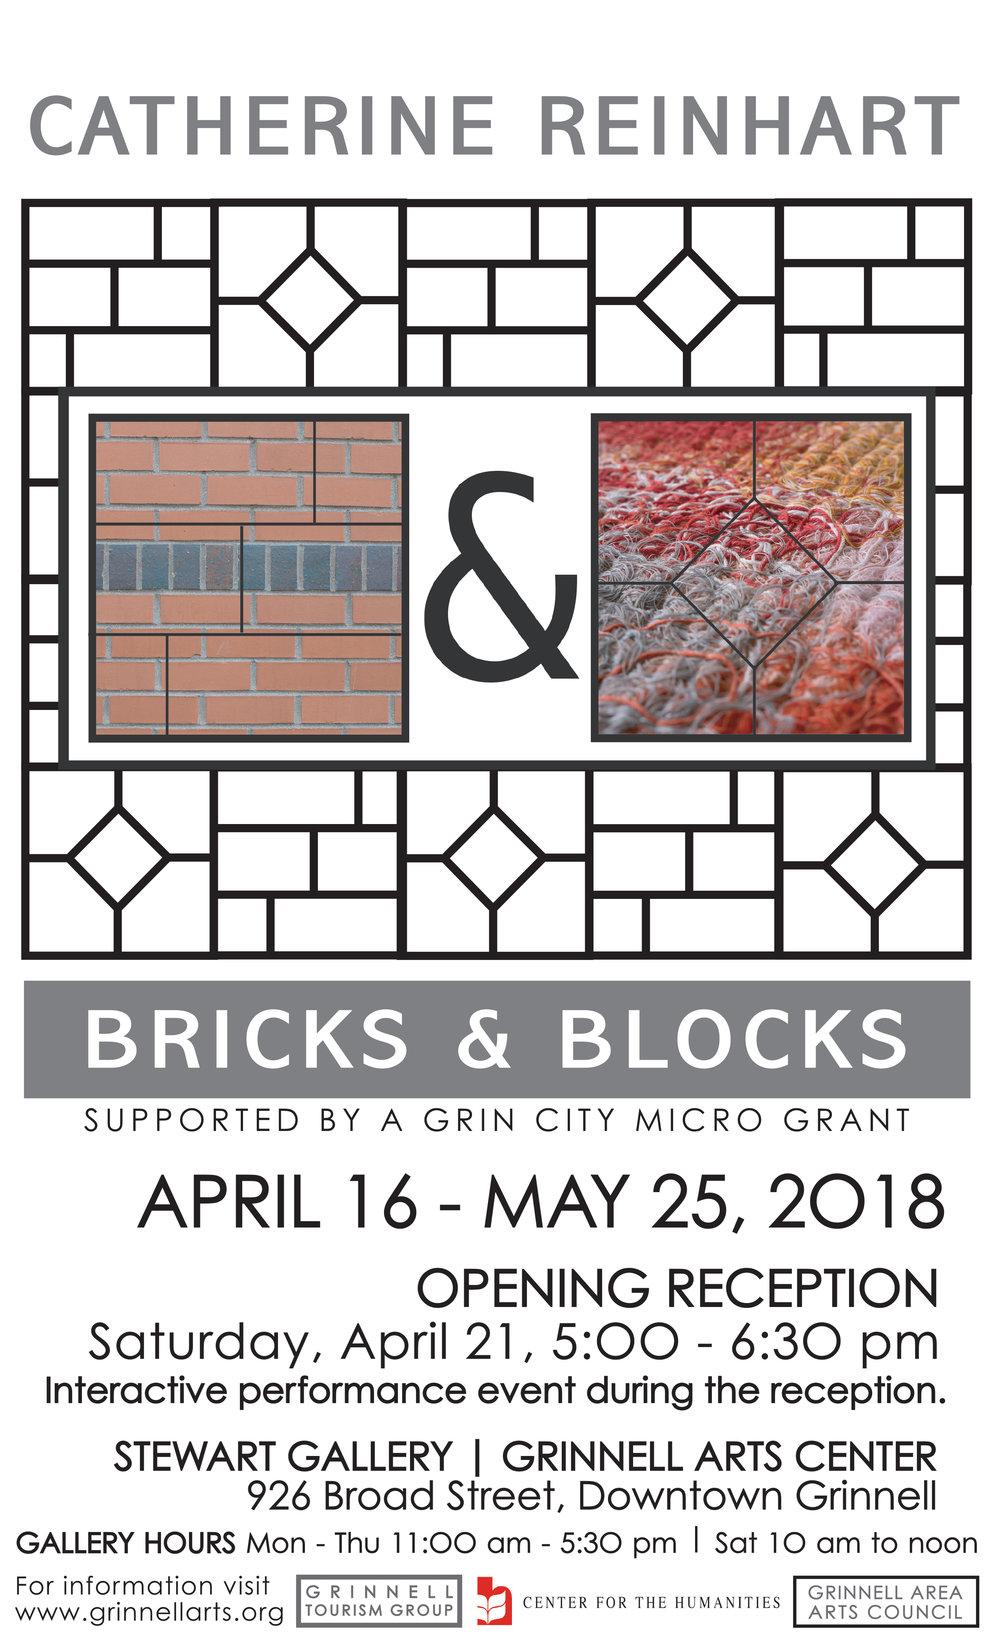 Bricks&Blocks Catherine Reinhart.jpg